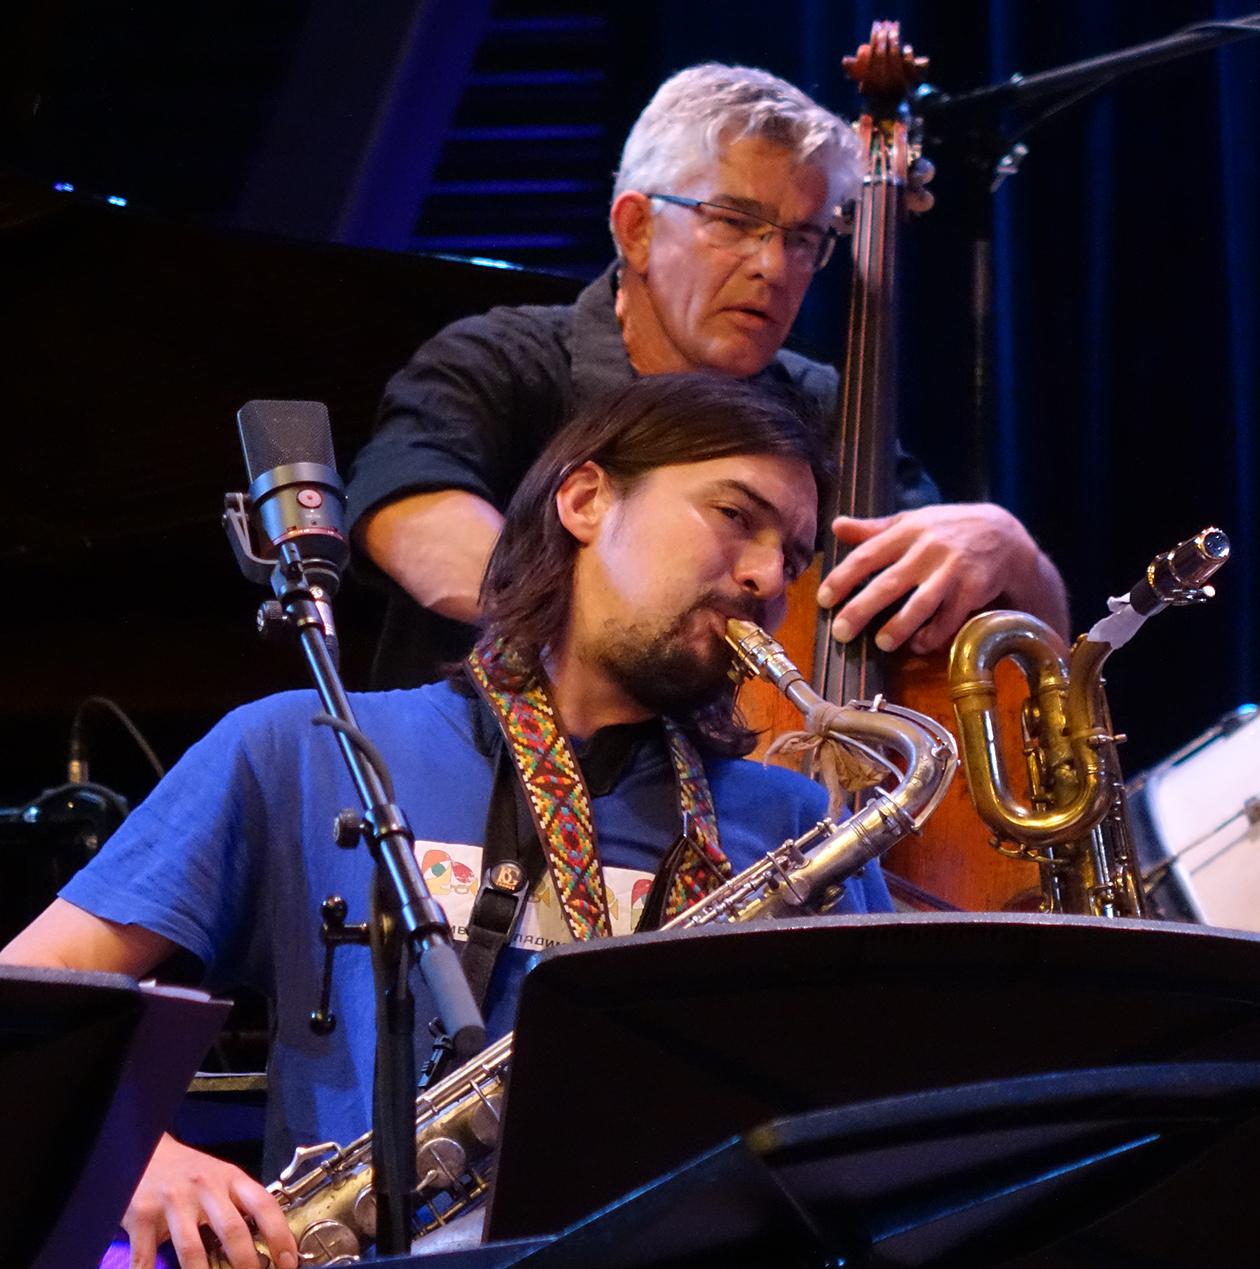 Wilbert de Joode and John Dikeman at Doek Festival 2015